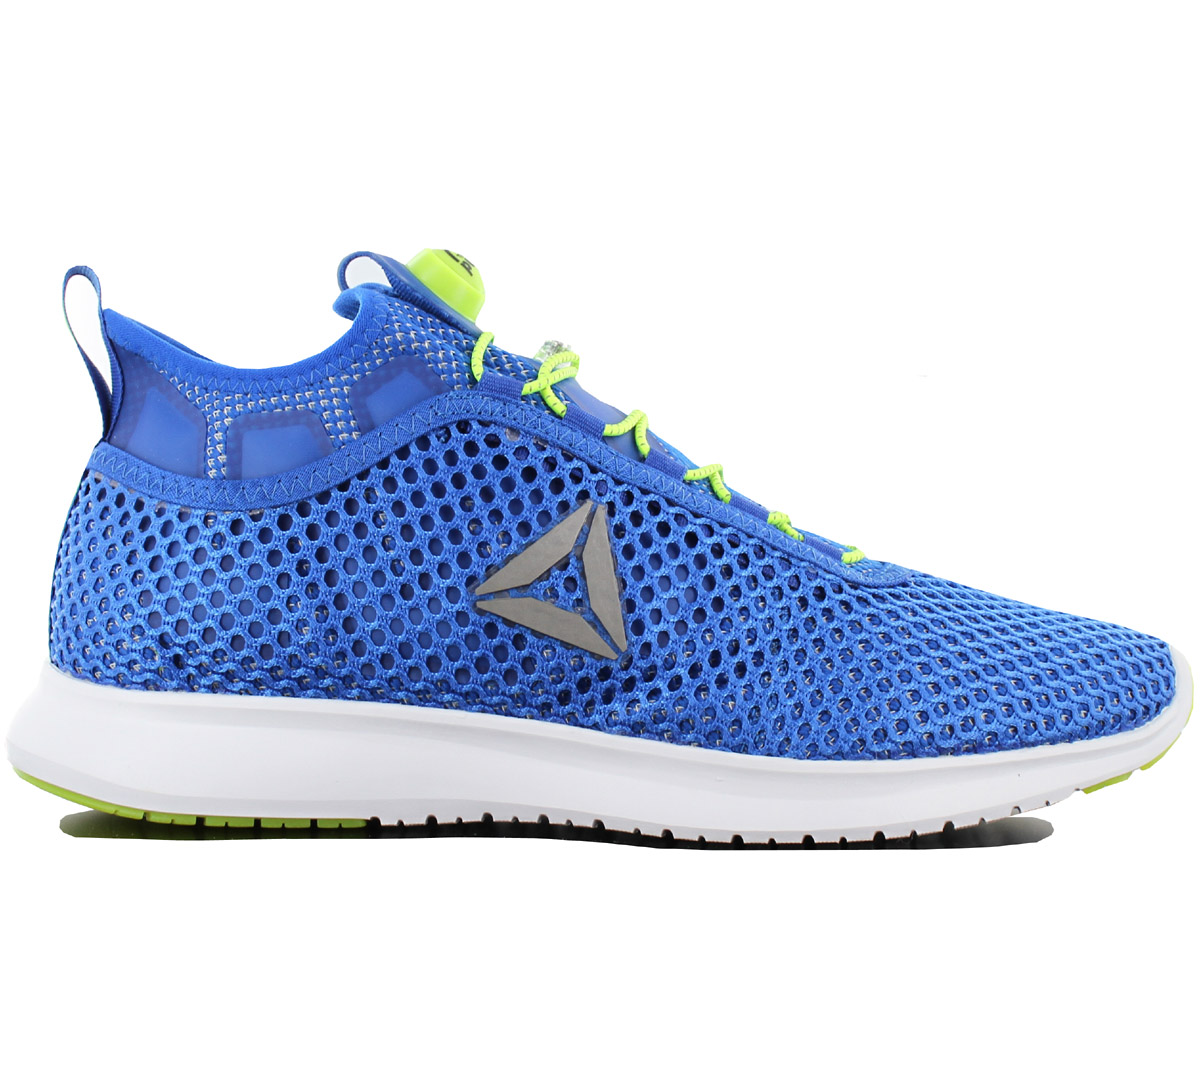 58959b6aad Details about Reebok the Pump plus Vortex Men's Shoes Blue Running Shoes  BD4878 New